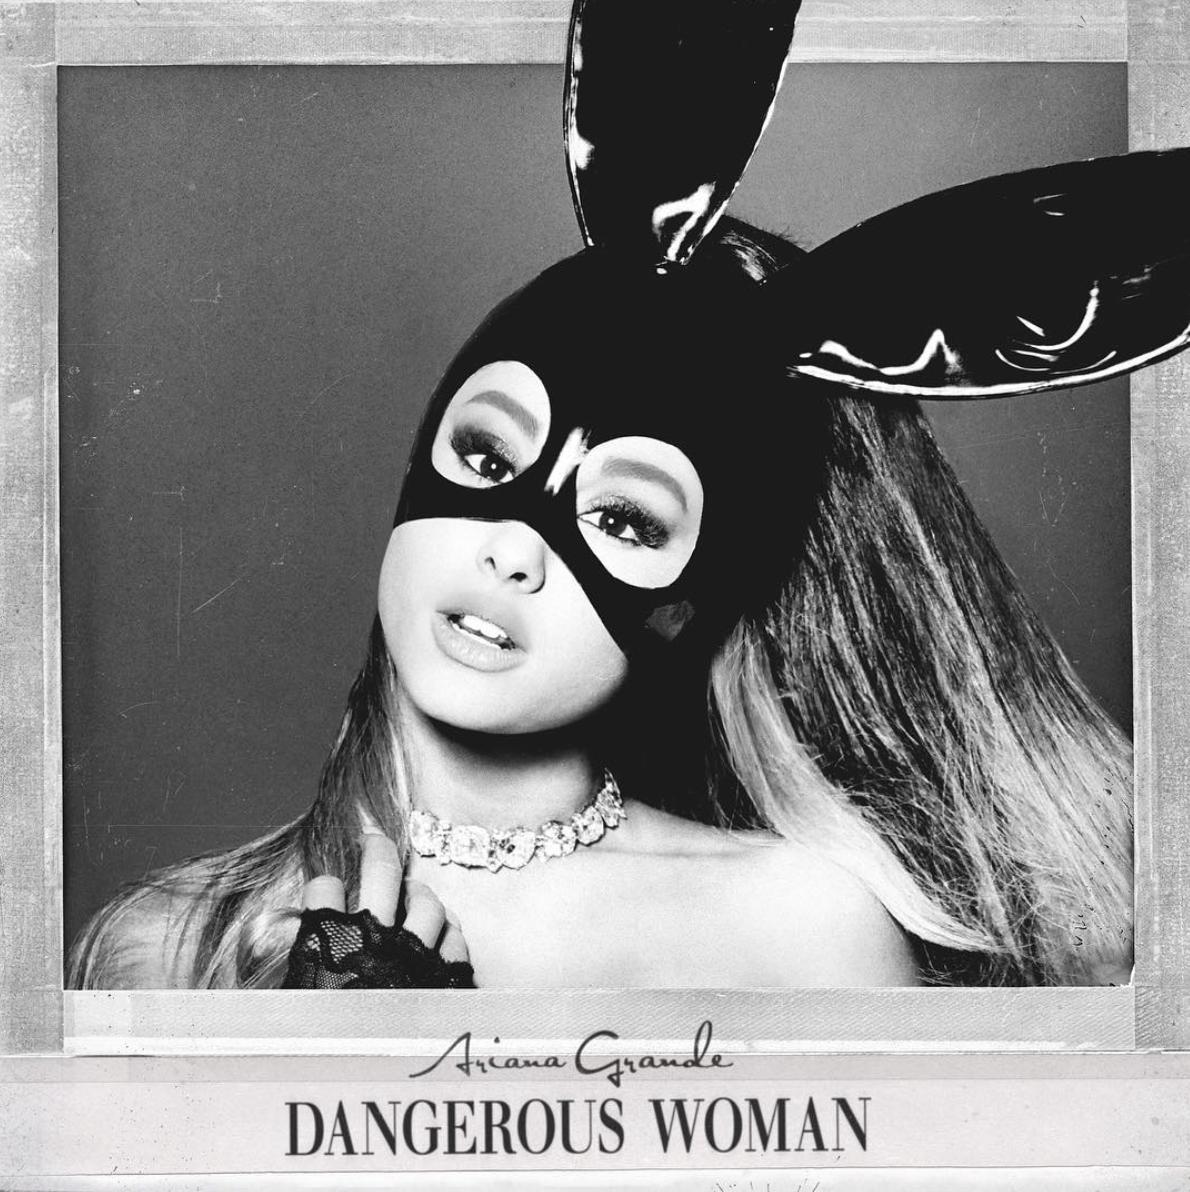 Ariana Grande Dangerous Woman Instagram